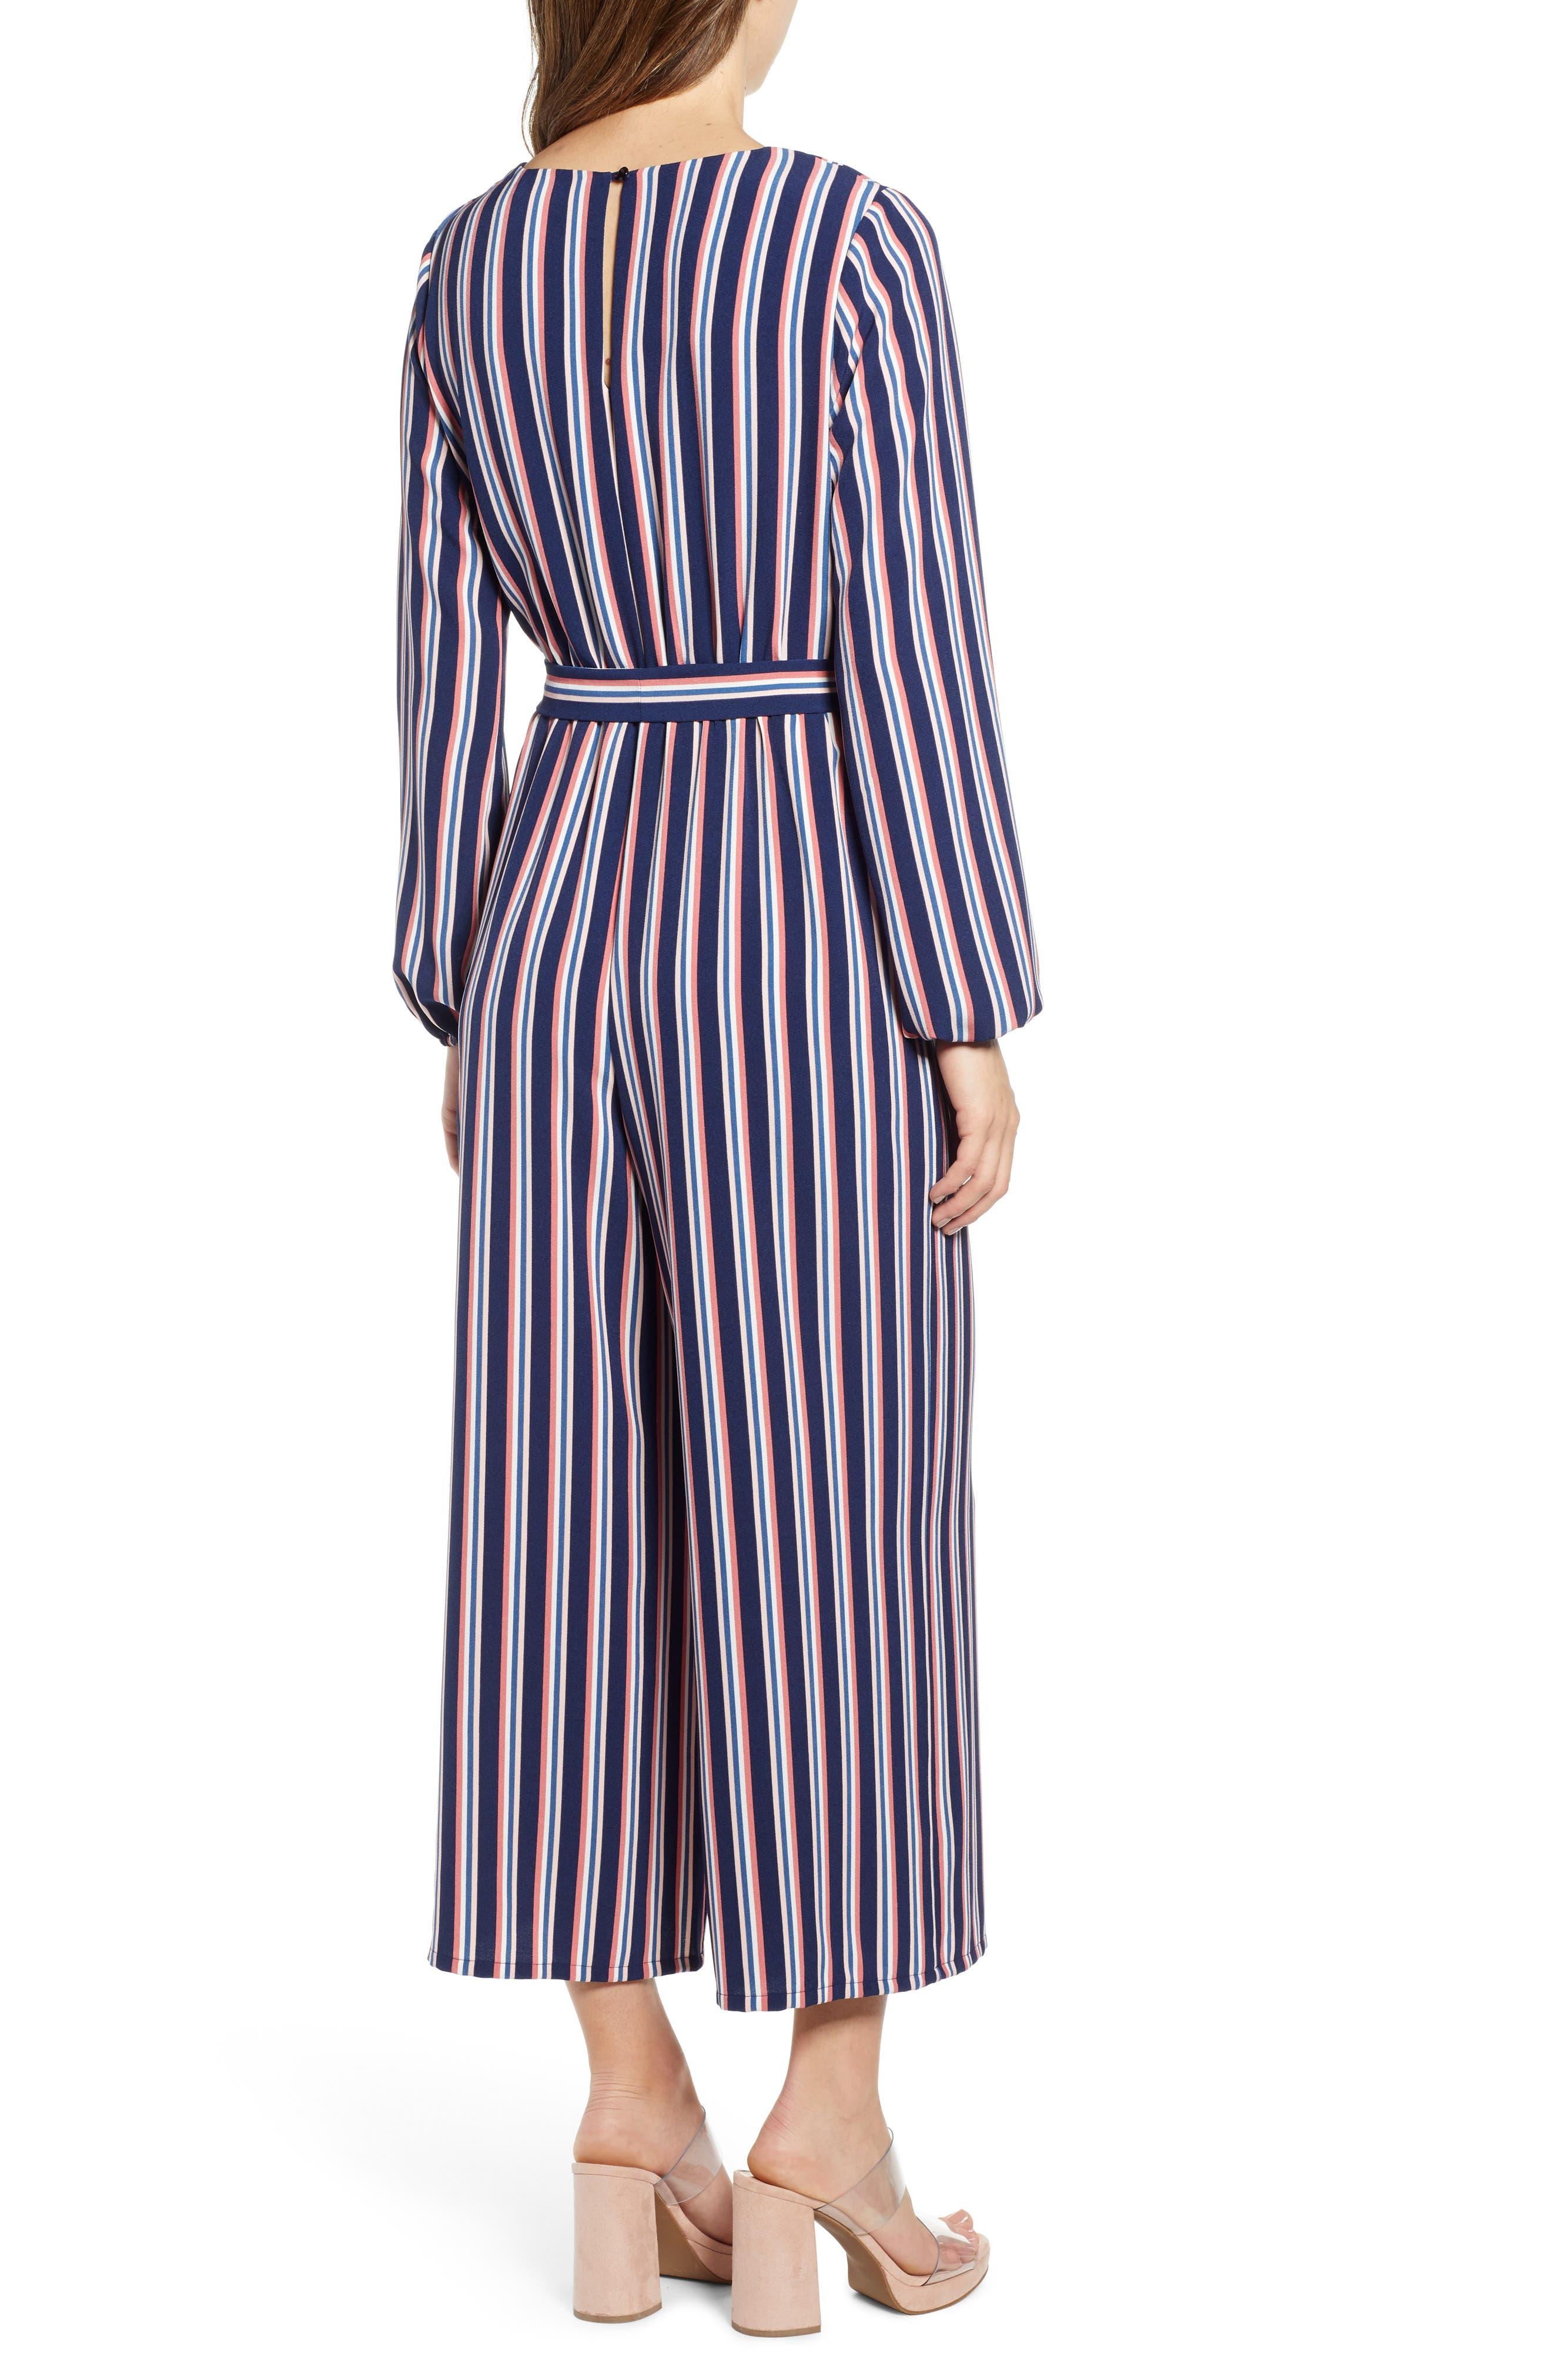 LEITH, Stripe Surplice Jumpsuit, Alternate thumbnail 2, color, NAVY PEACOAT FEM STRIPE